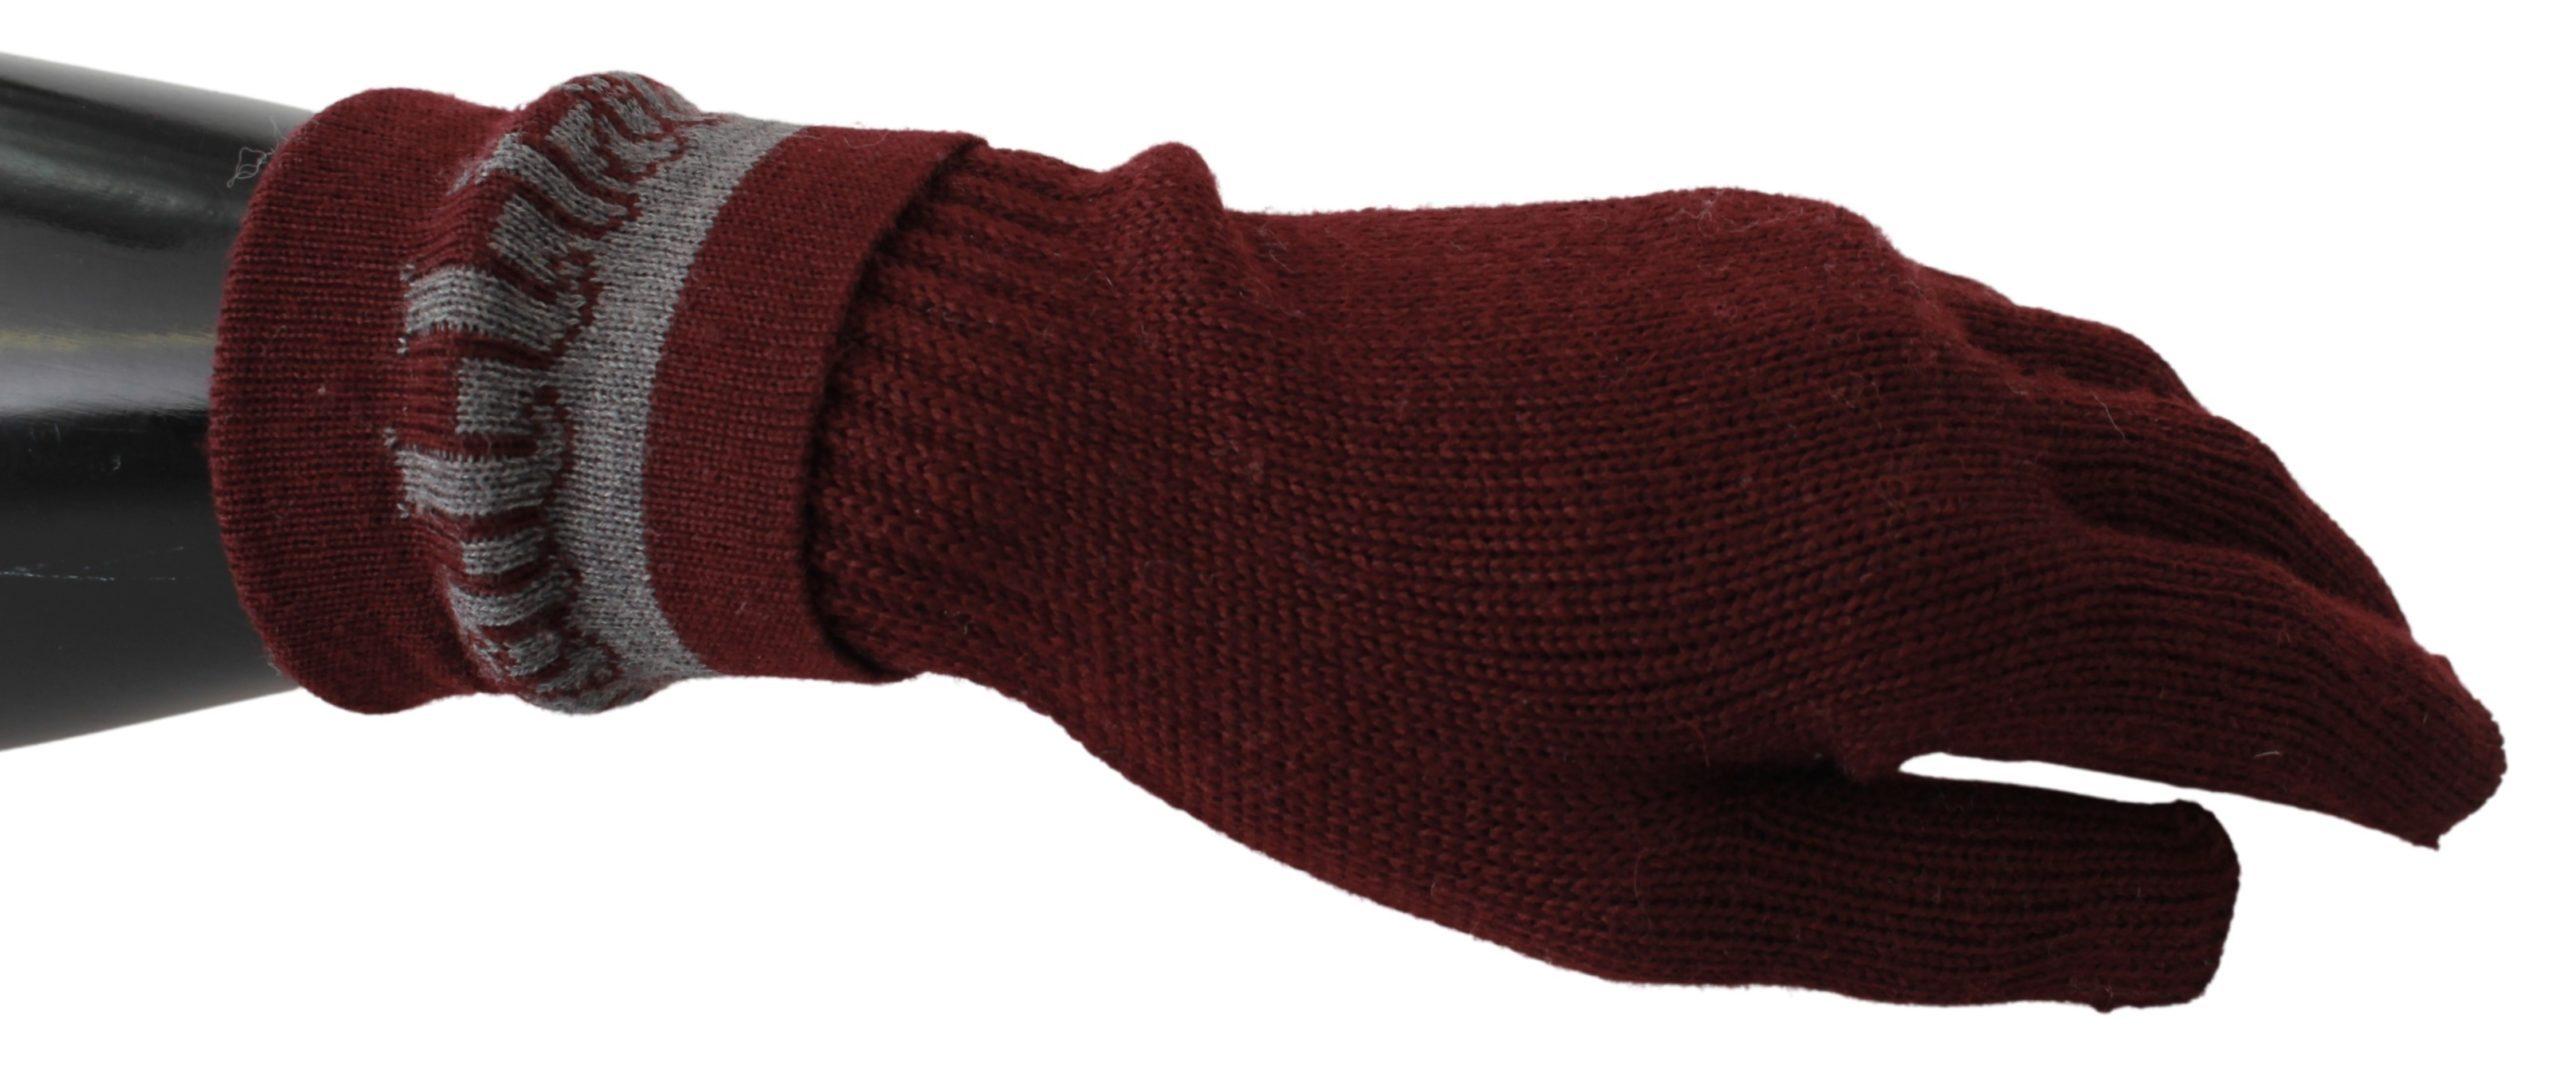 John Galliano Women's Elastic Wrist Mitten Gloves Bordeaux LB1021BG